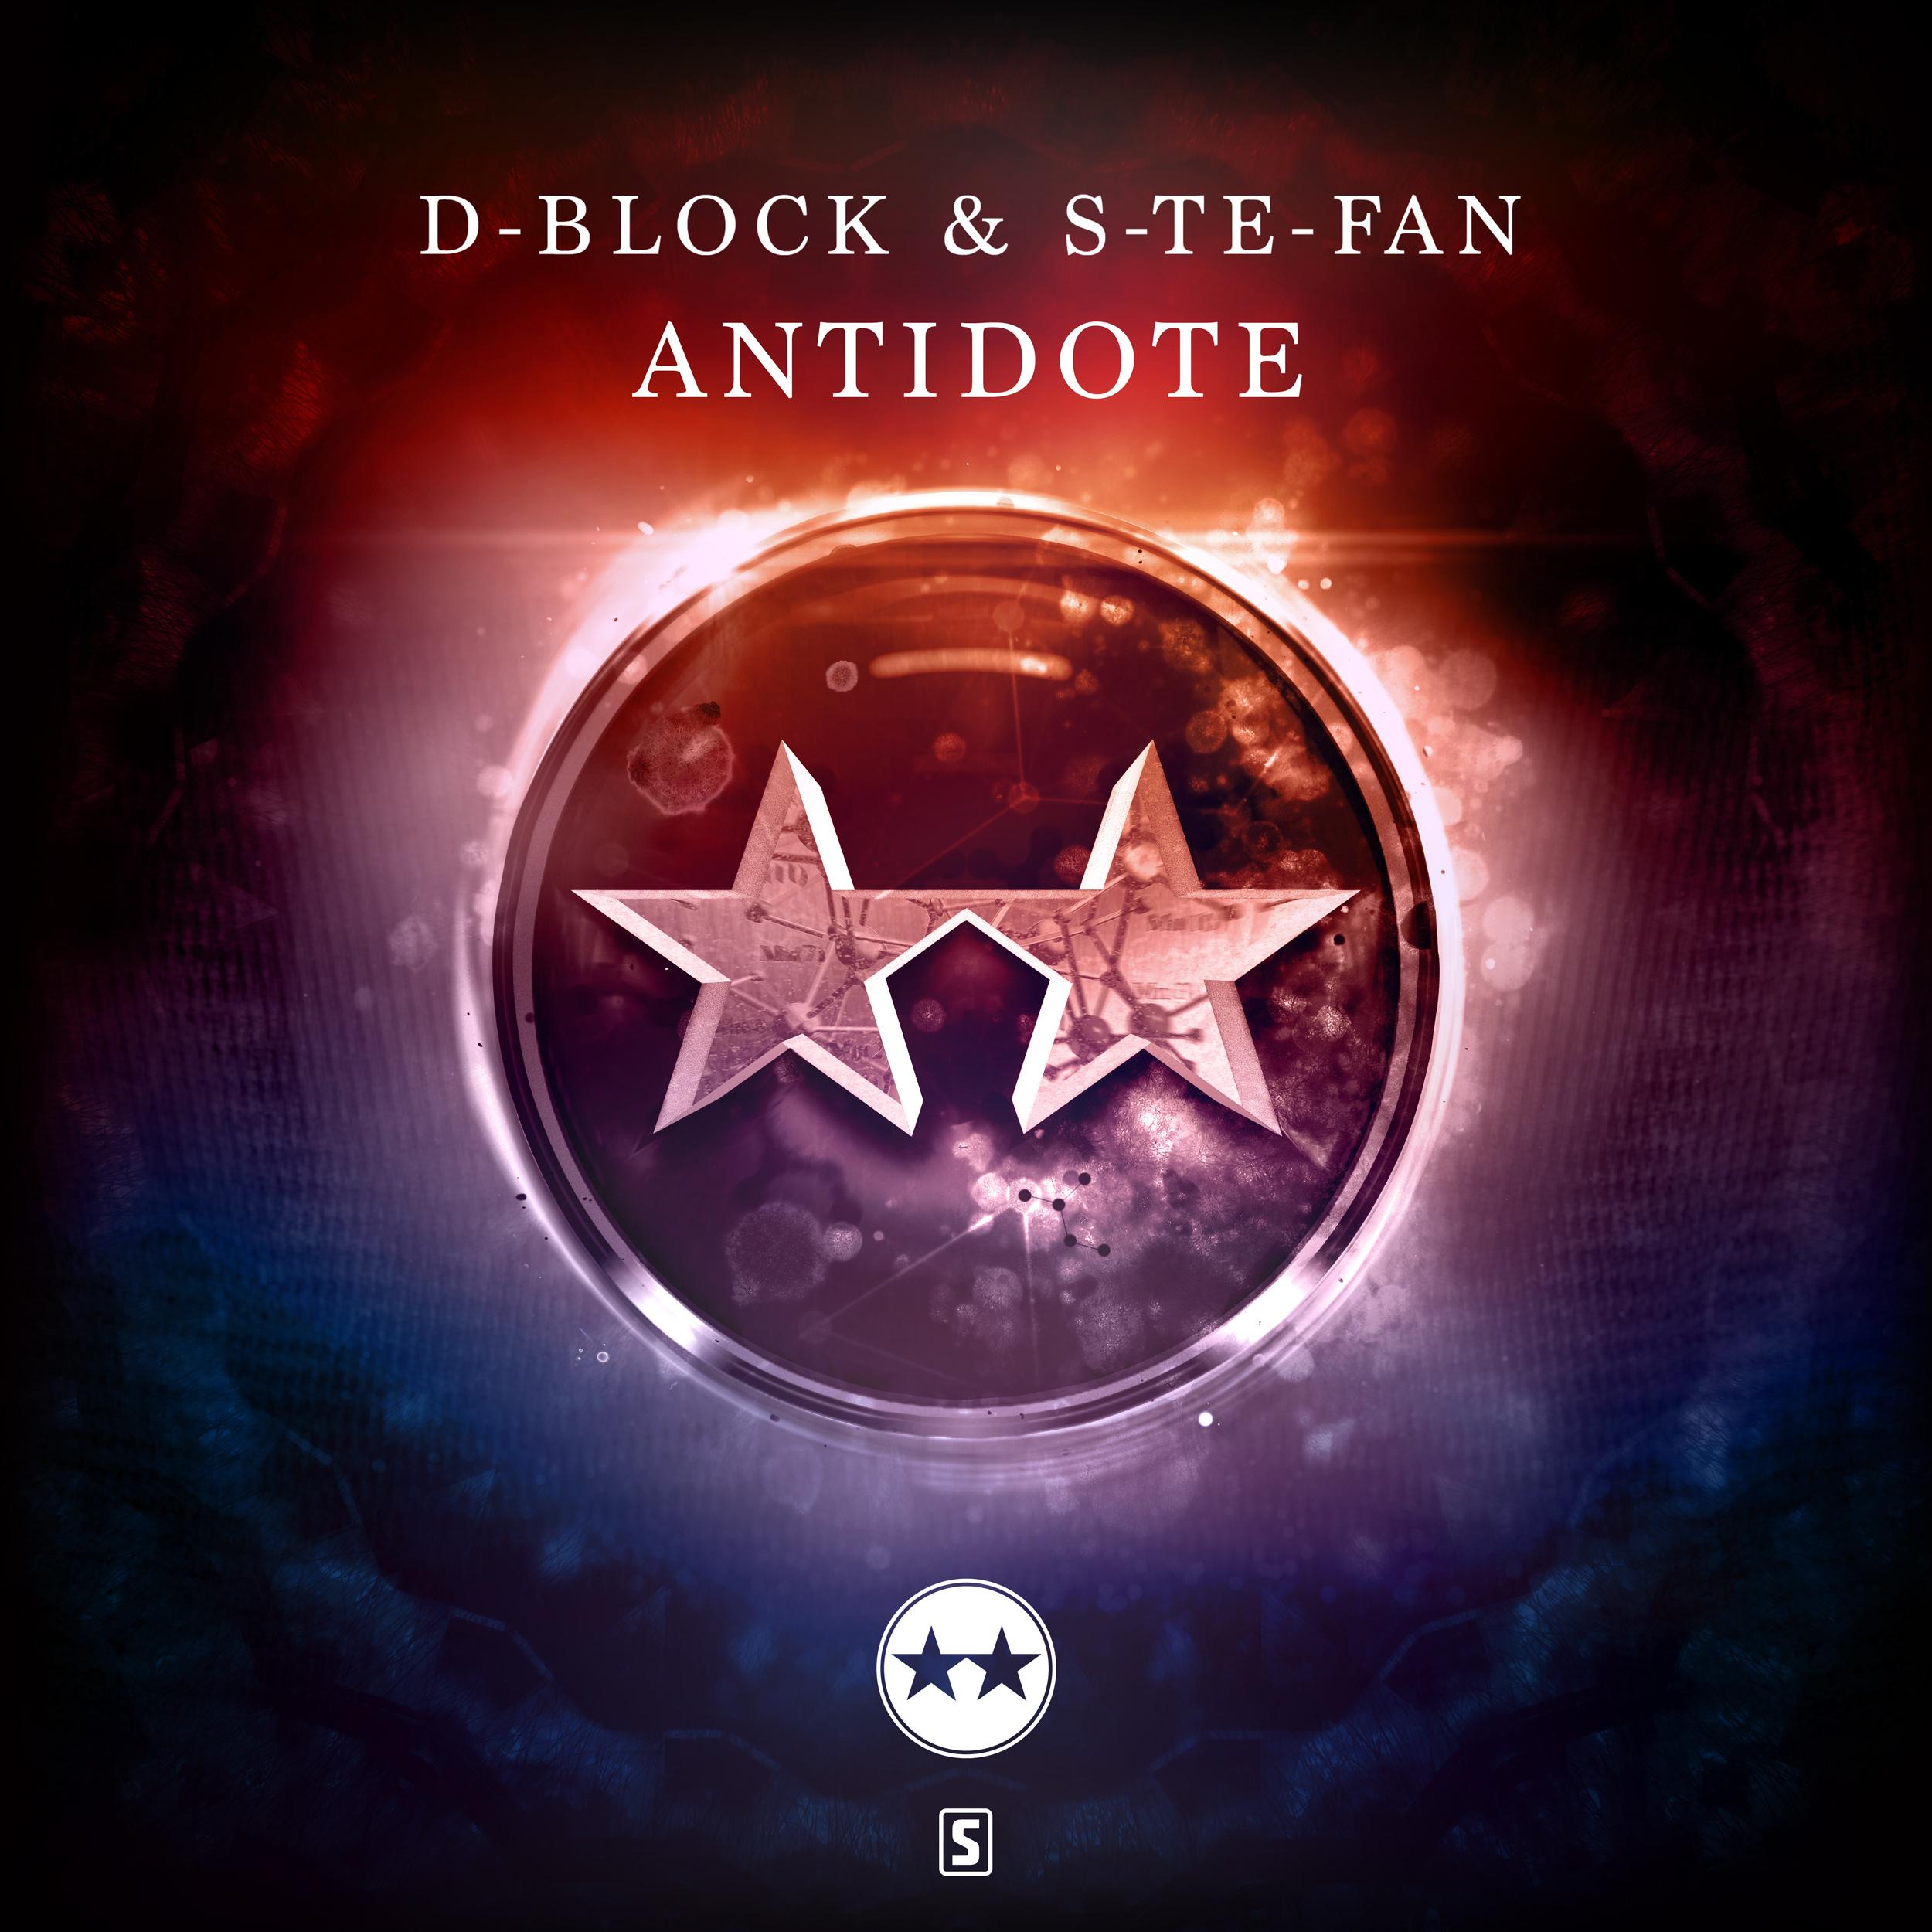 D-Block & S-te-Fan - Antidote [SCANTRAXX EVOLUTIONZ] EVO040